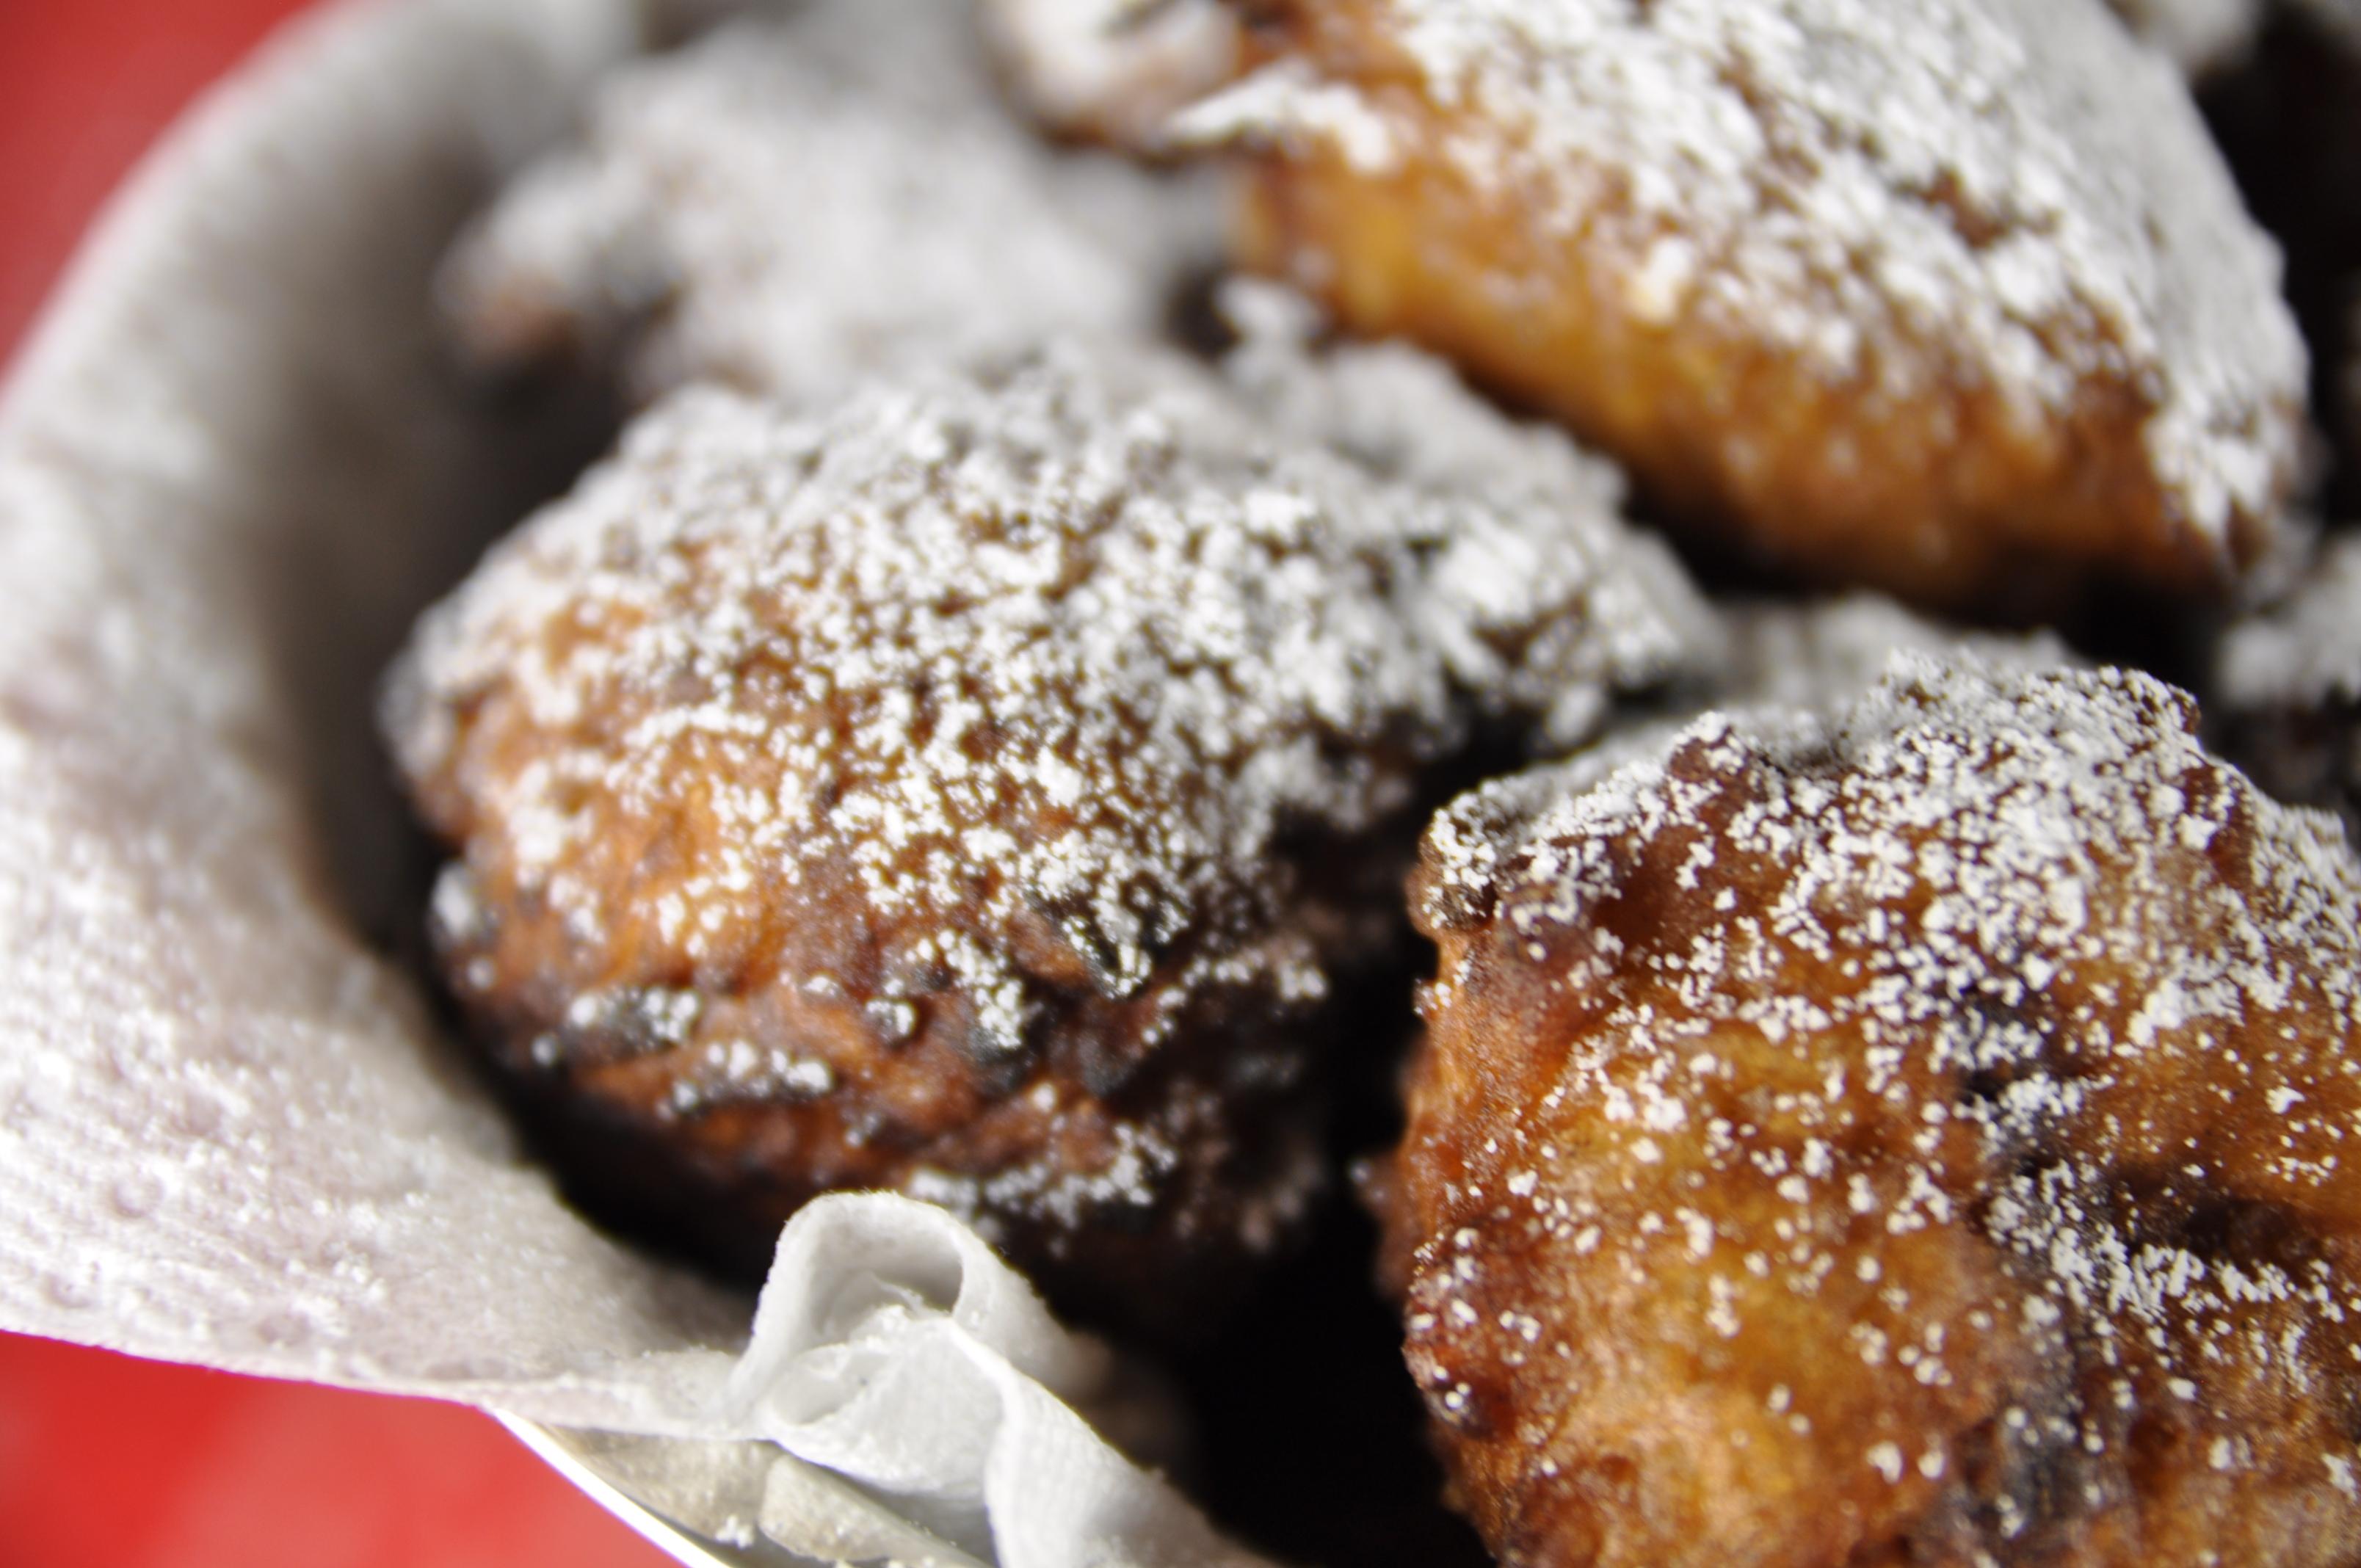 Calas: New Orleans Sweet Fried Rice Cakes (Mardi Gras Recipe)